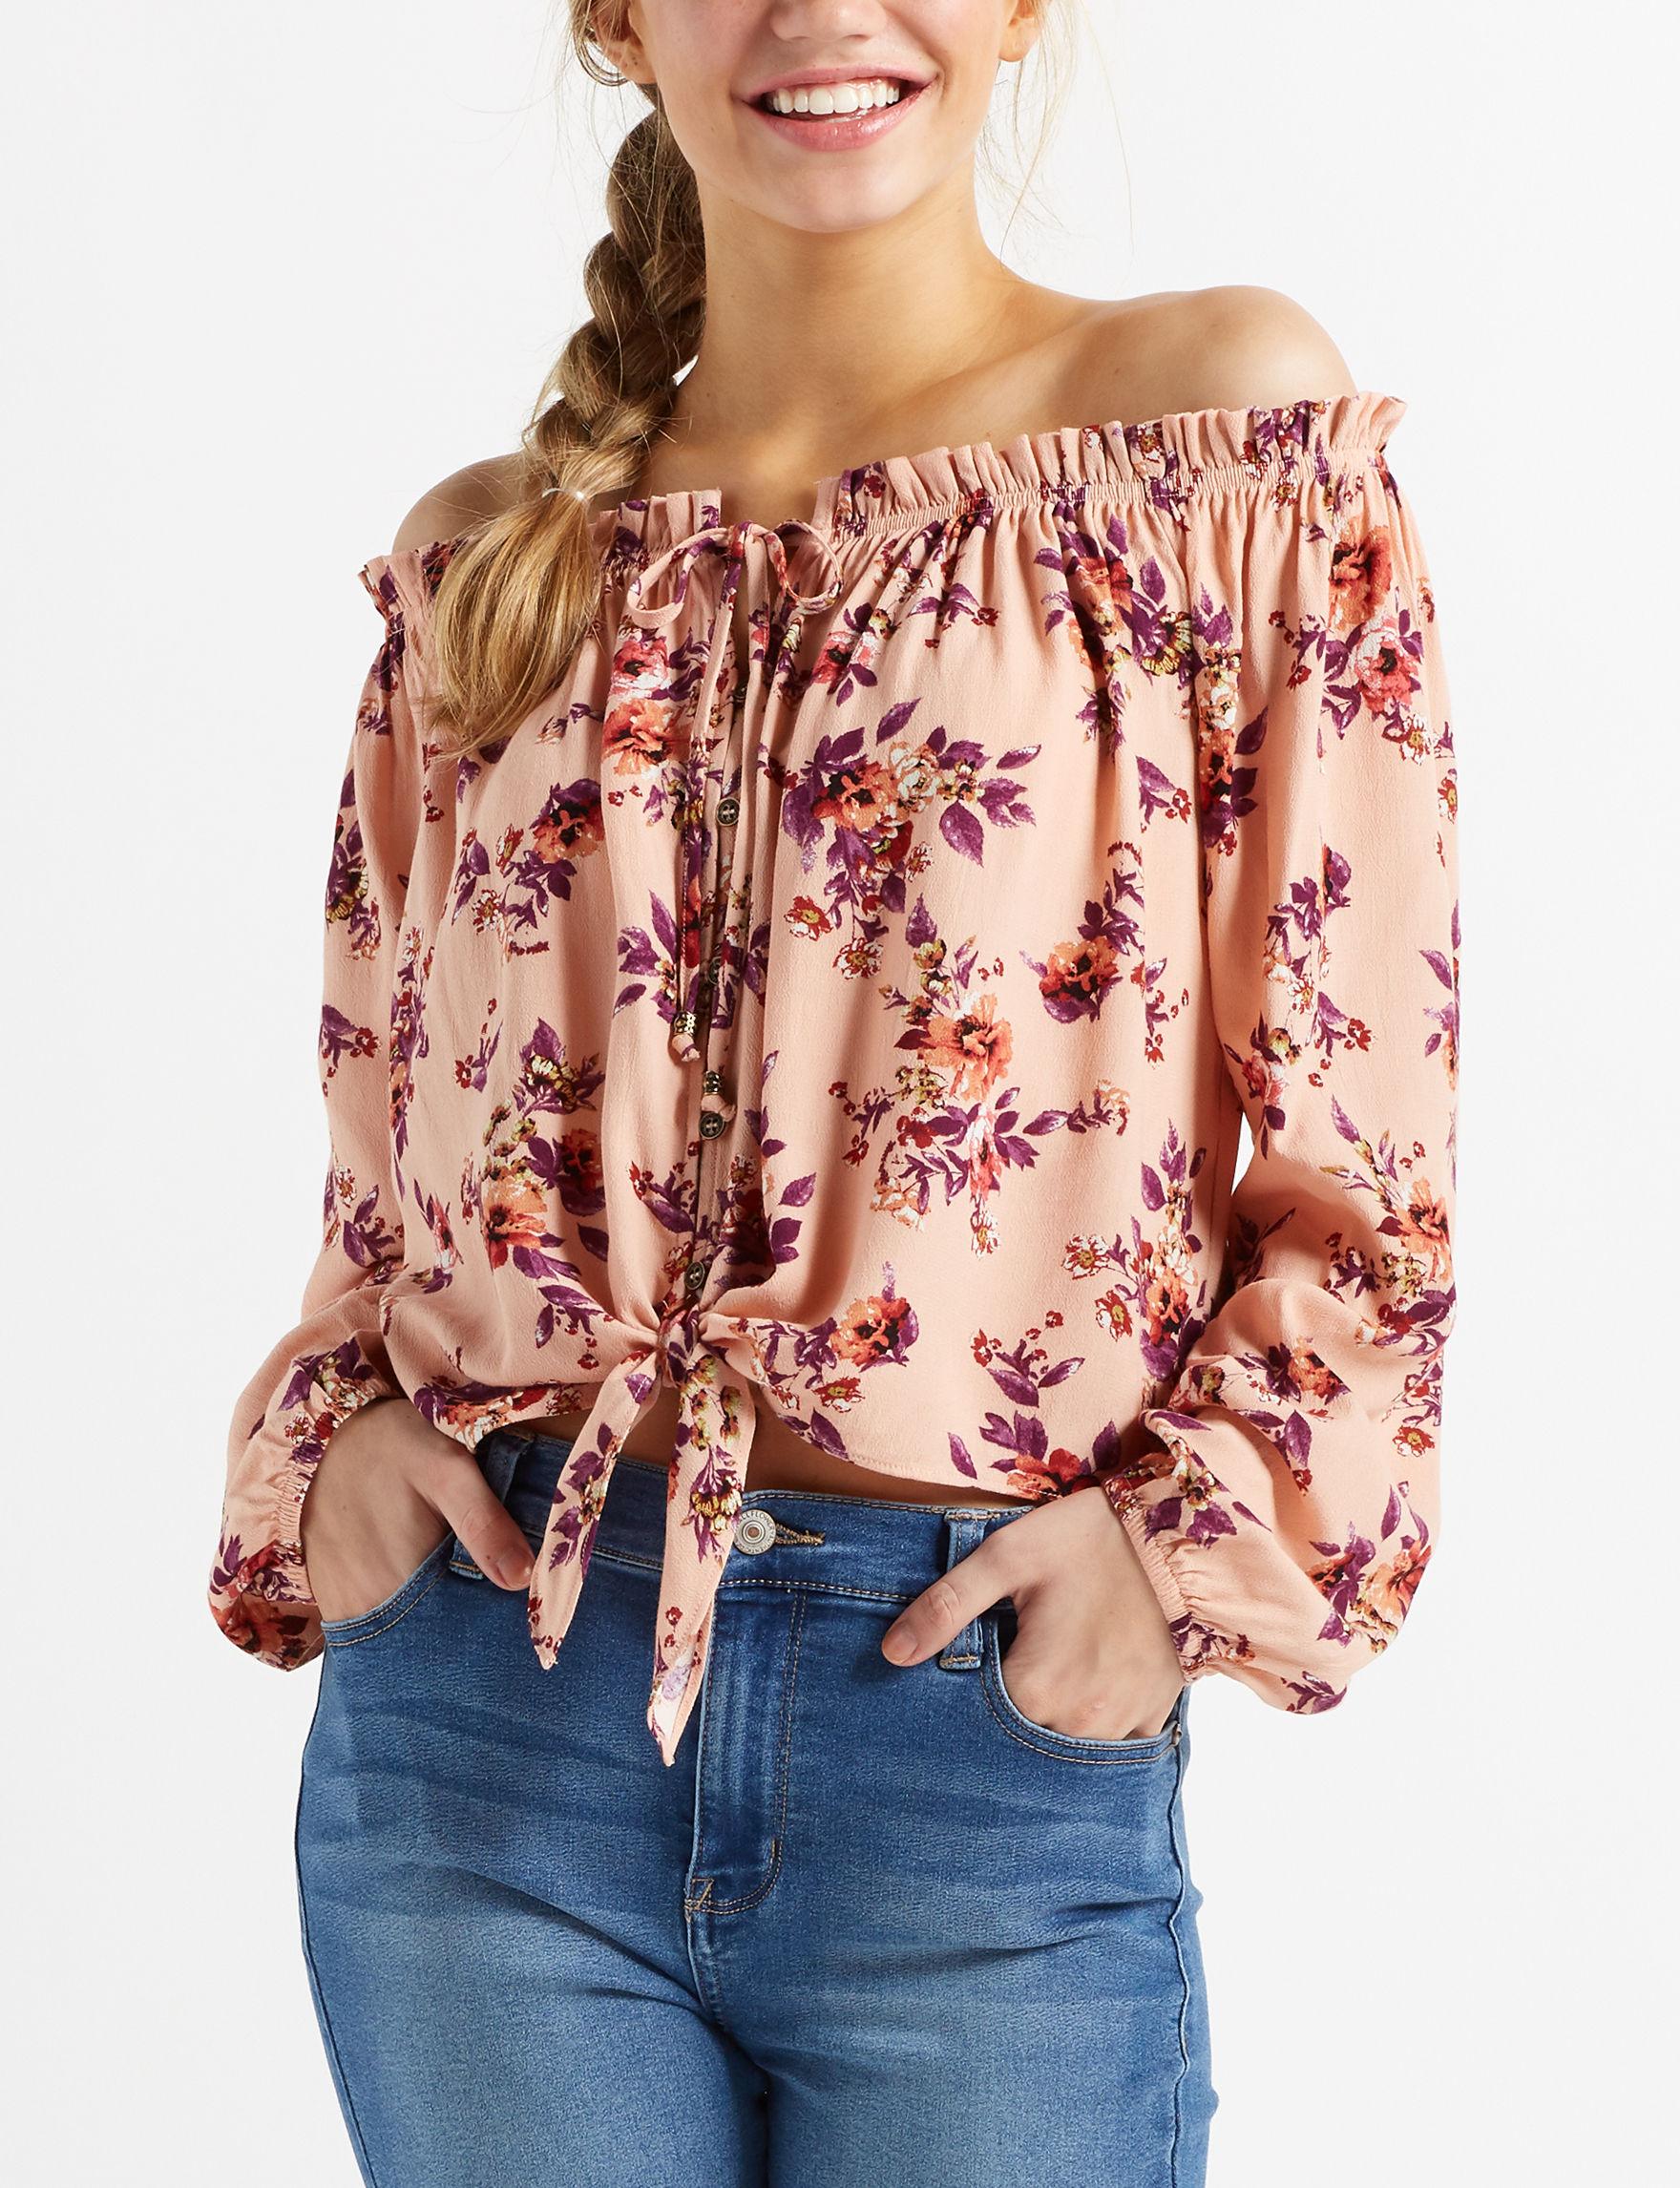 Jolt Coral Shirts & Blouses